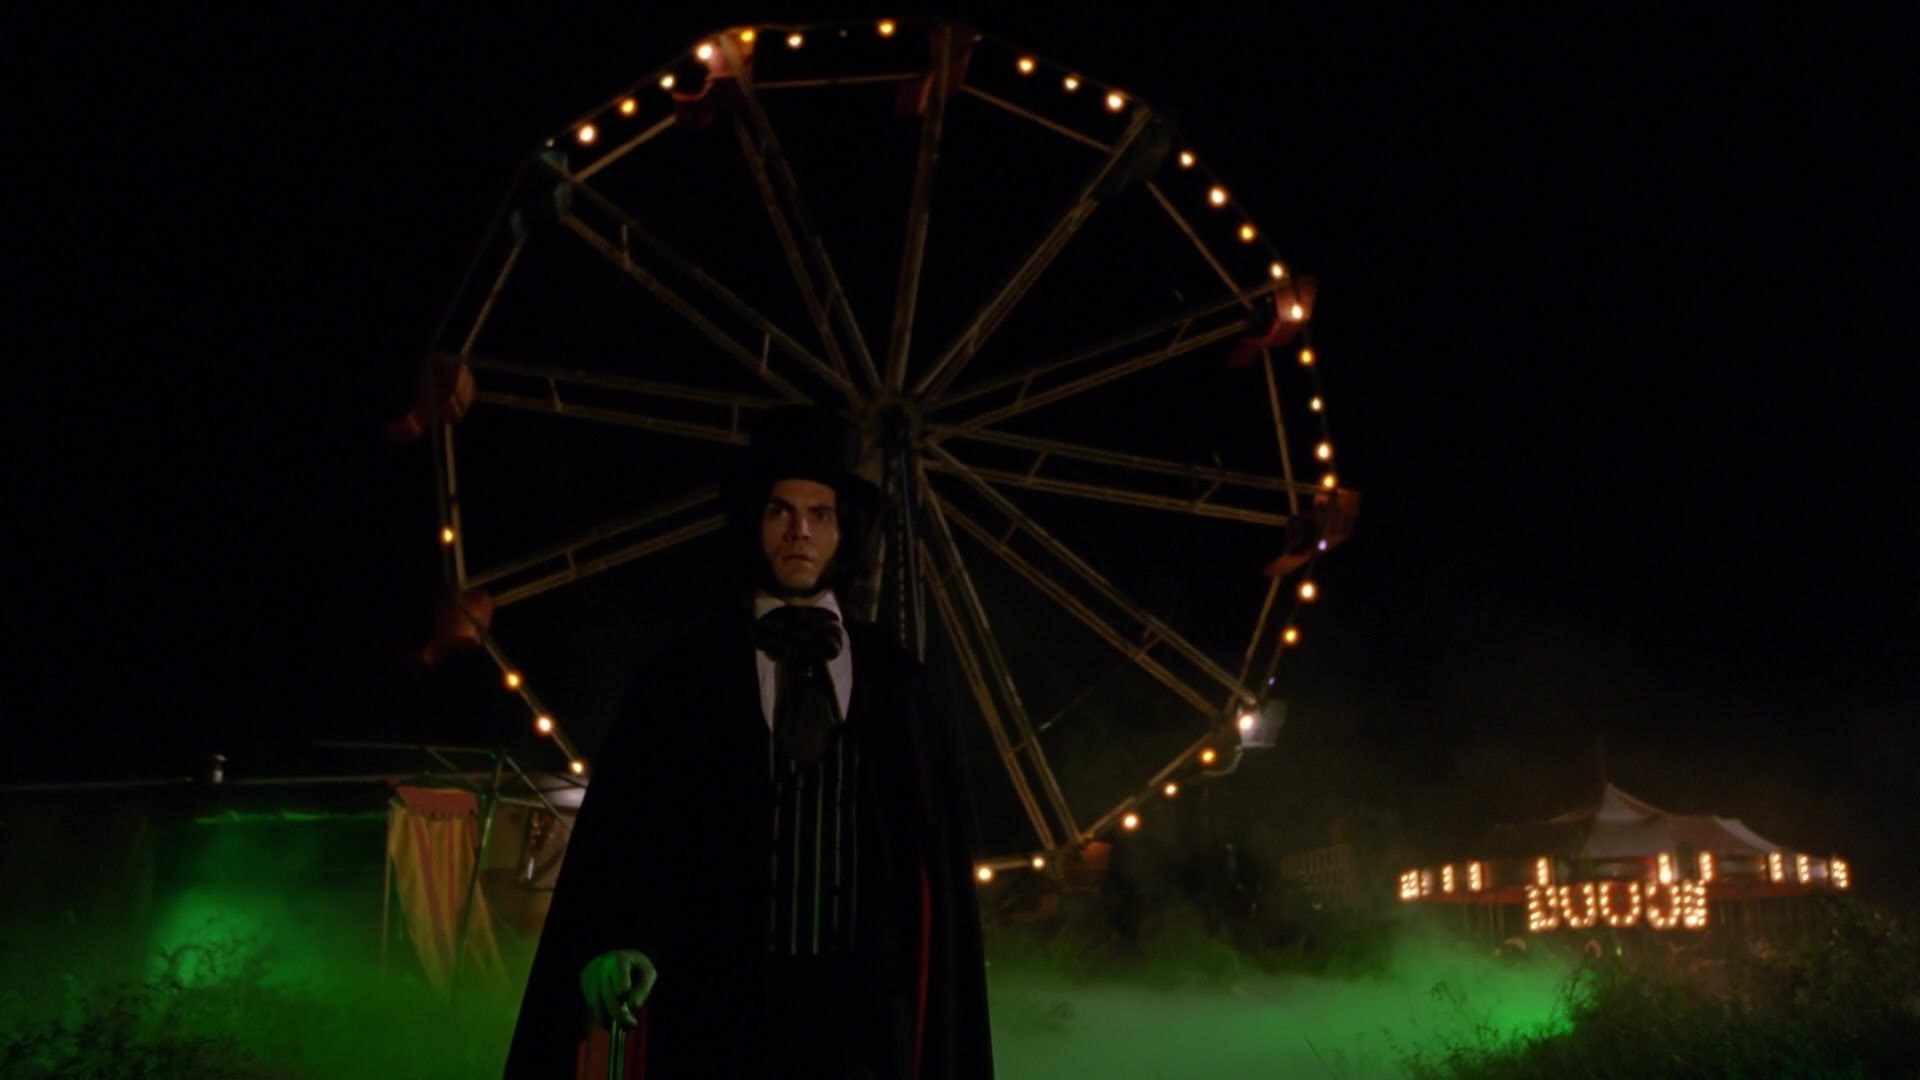 American_Horror_Story_   AHS Freak Show   Pinterest   Edward mordrake,  Voldemort and American horror story